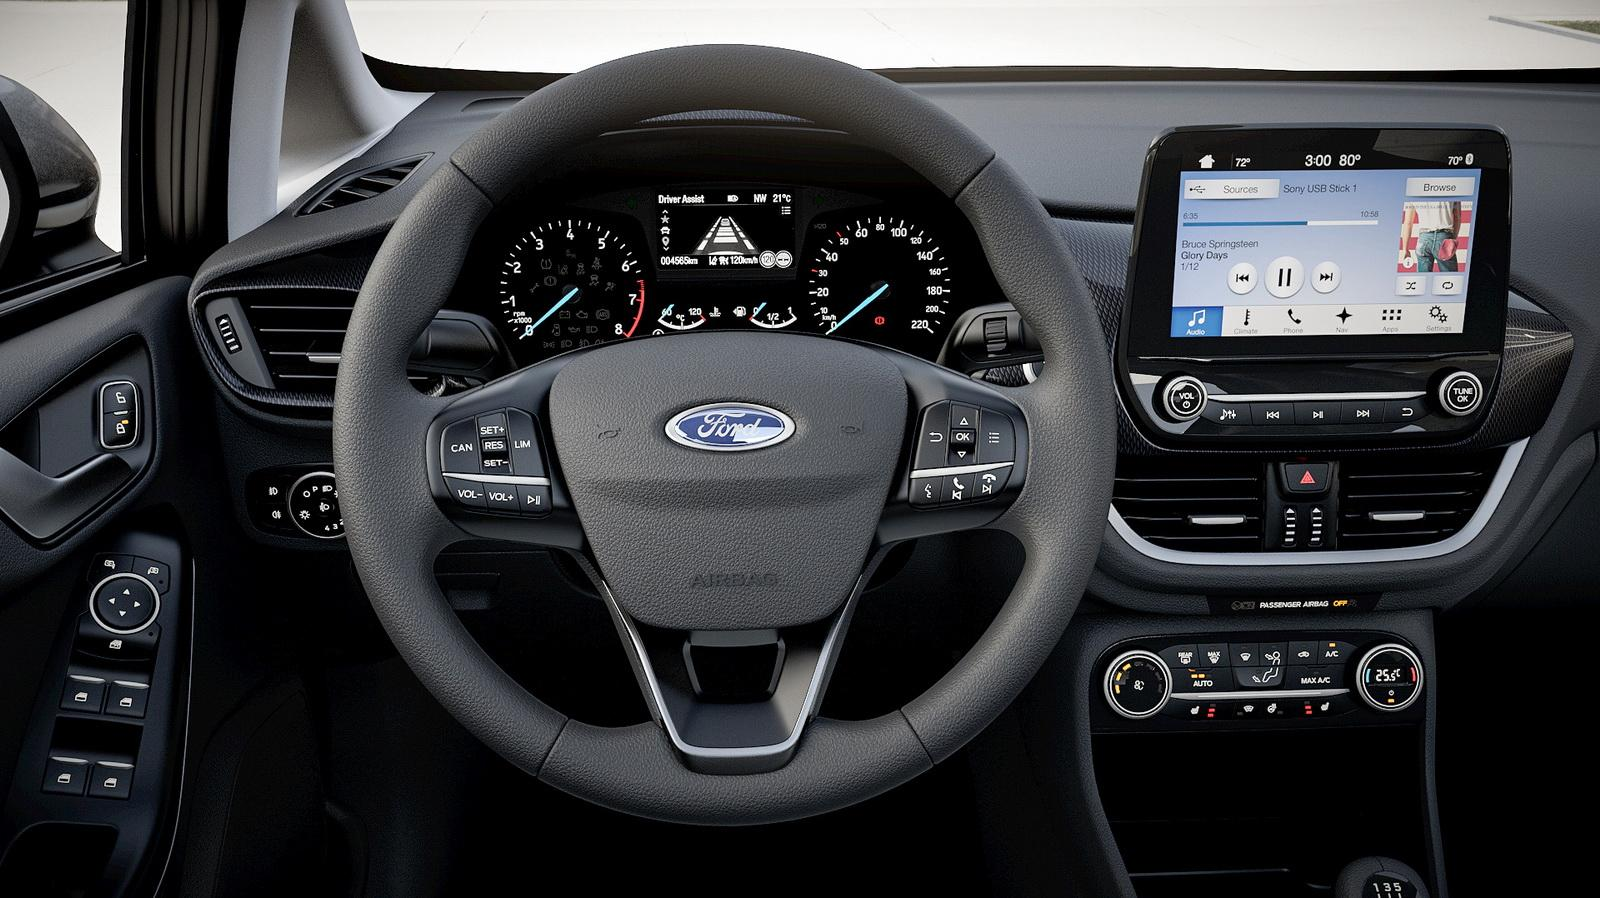 Ford Fiesta (2018) - Targi i wystawy samochodowe - Galeria ...